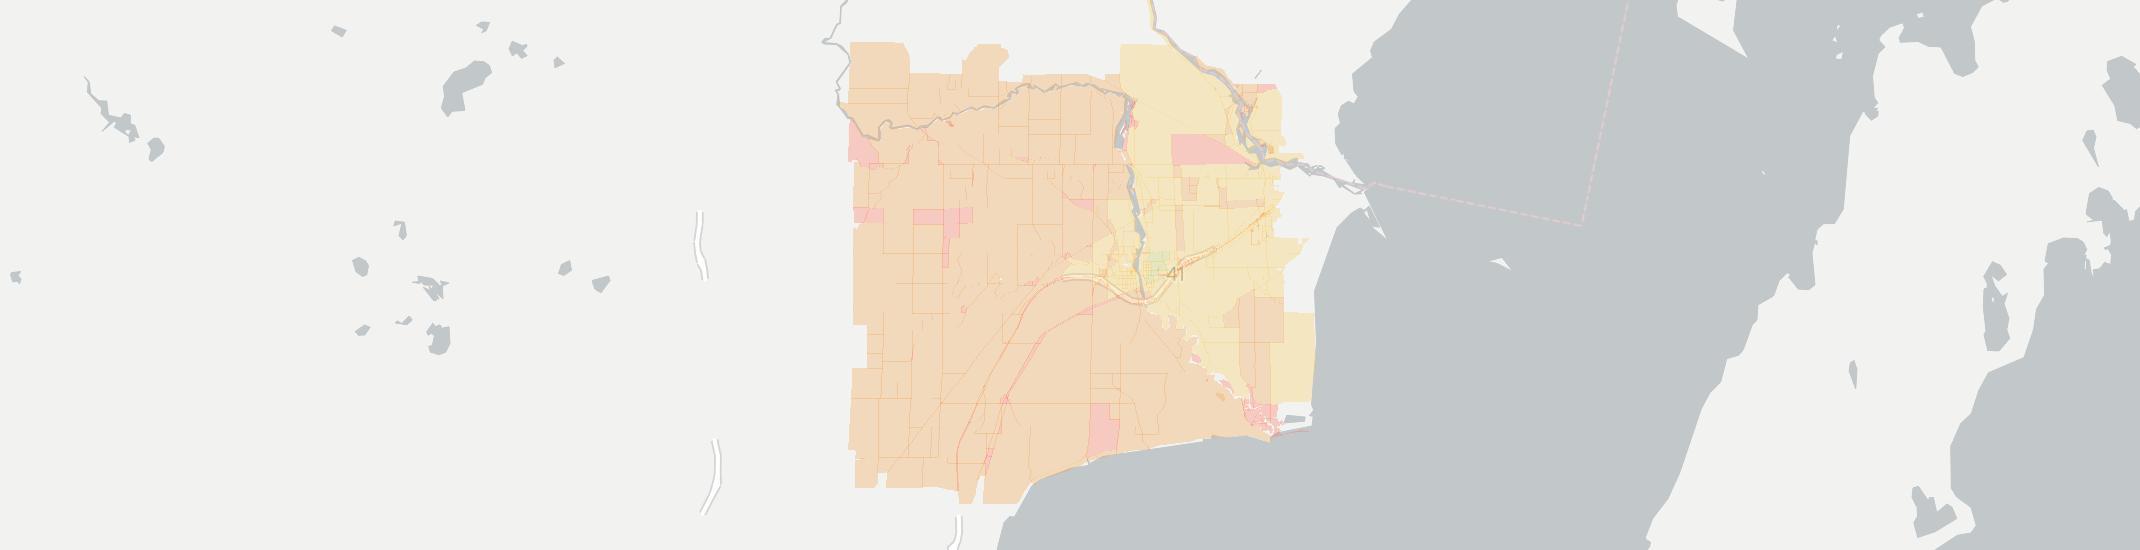 Peshtigo Internet Competition Map. Click for interactive map.